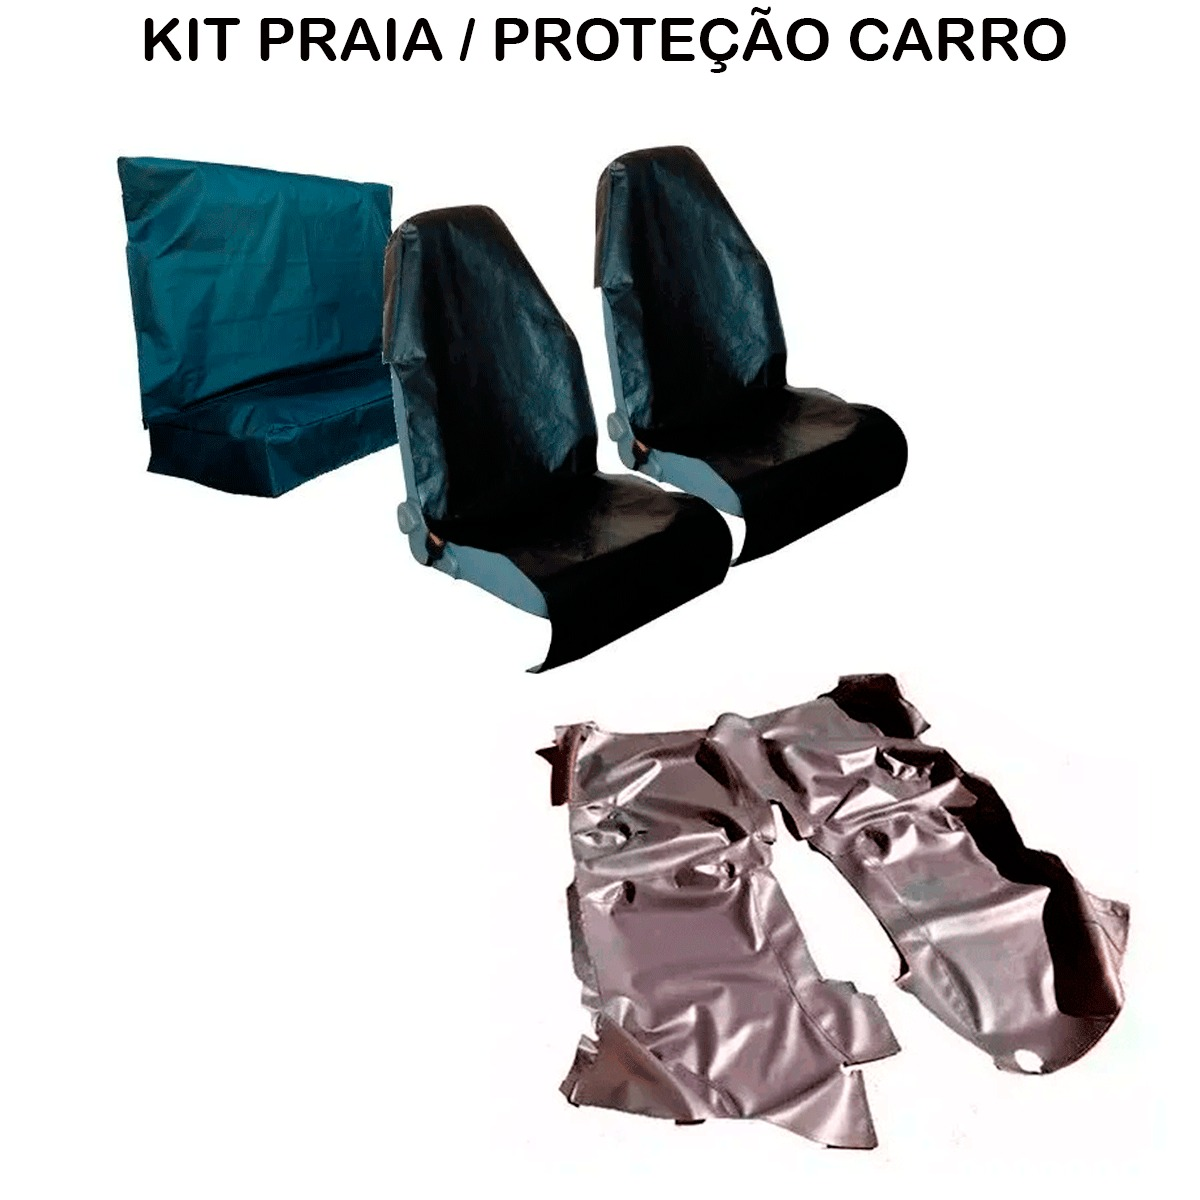 Tapete Em Vinil Volkswagen Gol Bola + Capa Banco Protecao Banco Areia Suor Academia